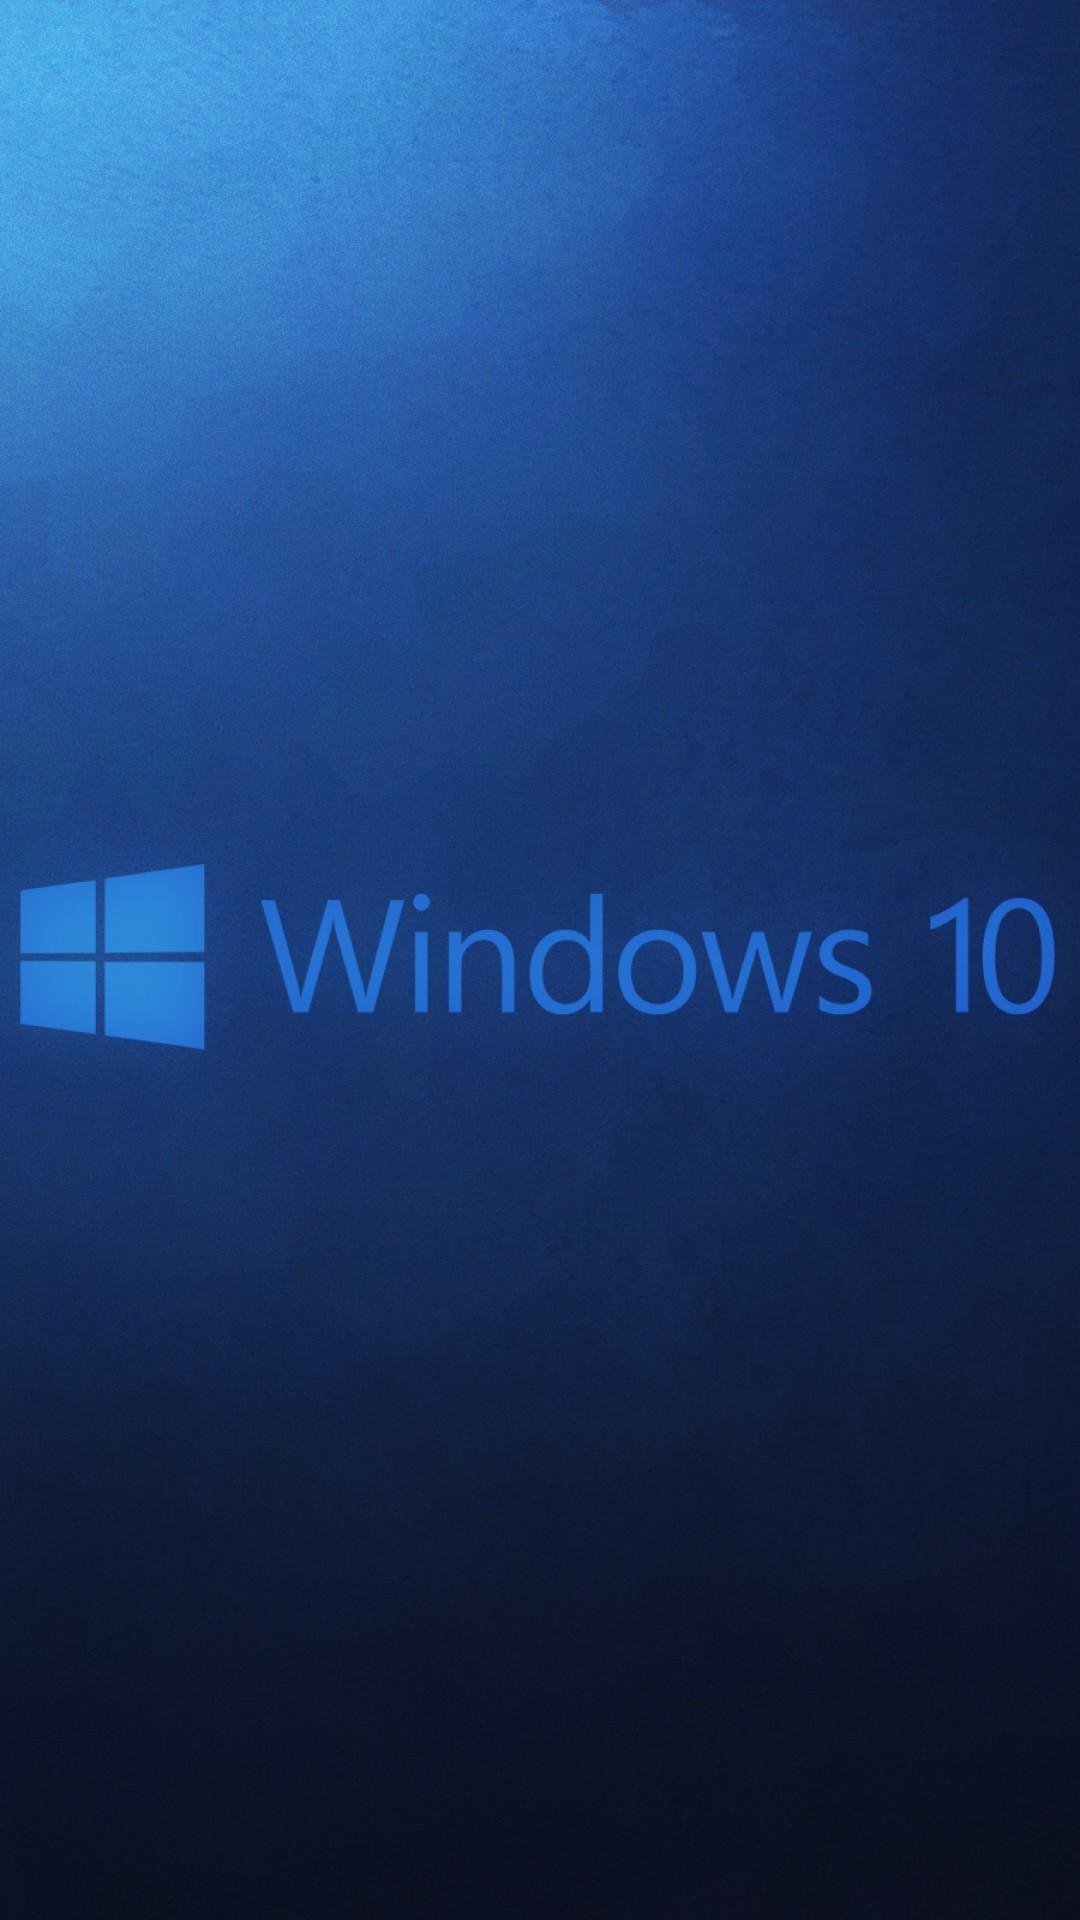 HD Background Windows 10 Wallpaper Microsoft Operating System Blue .